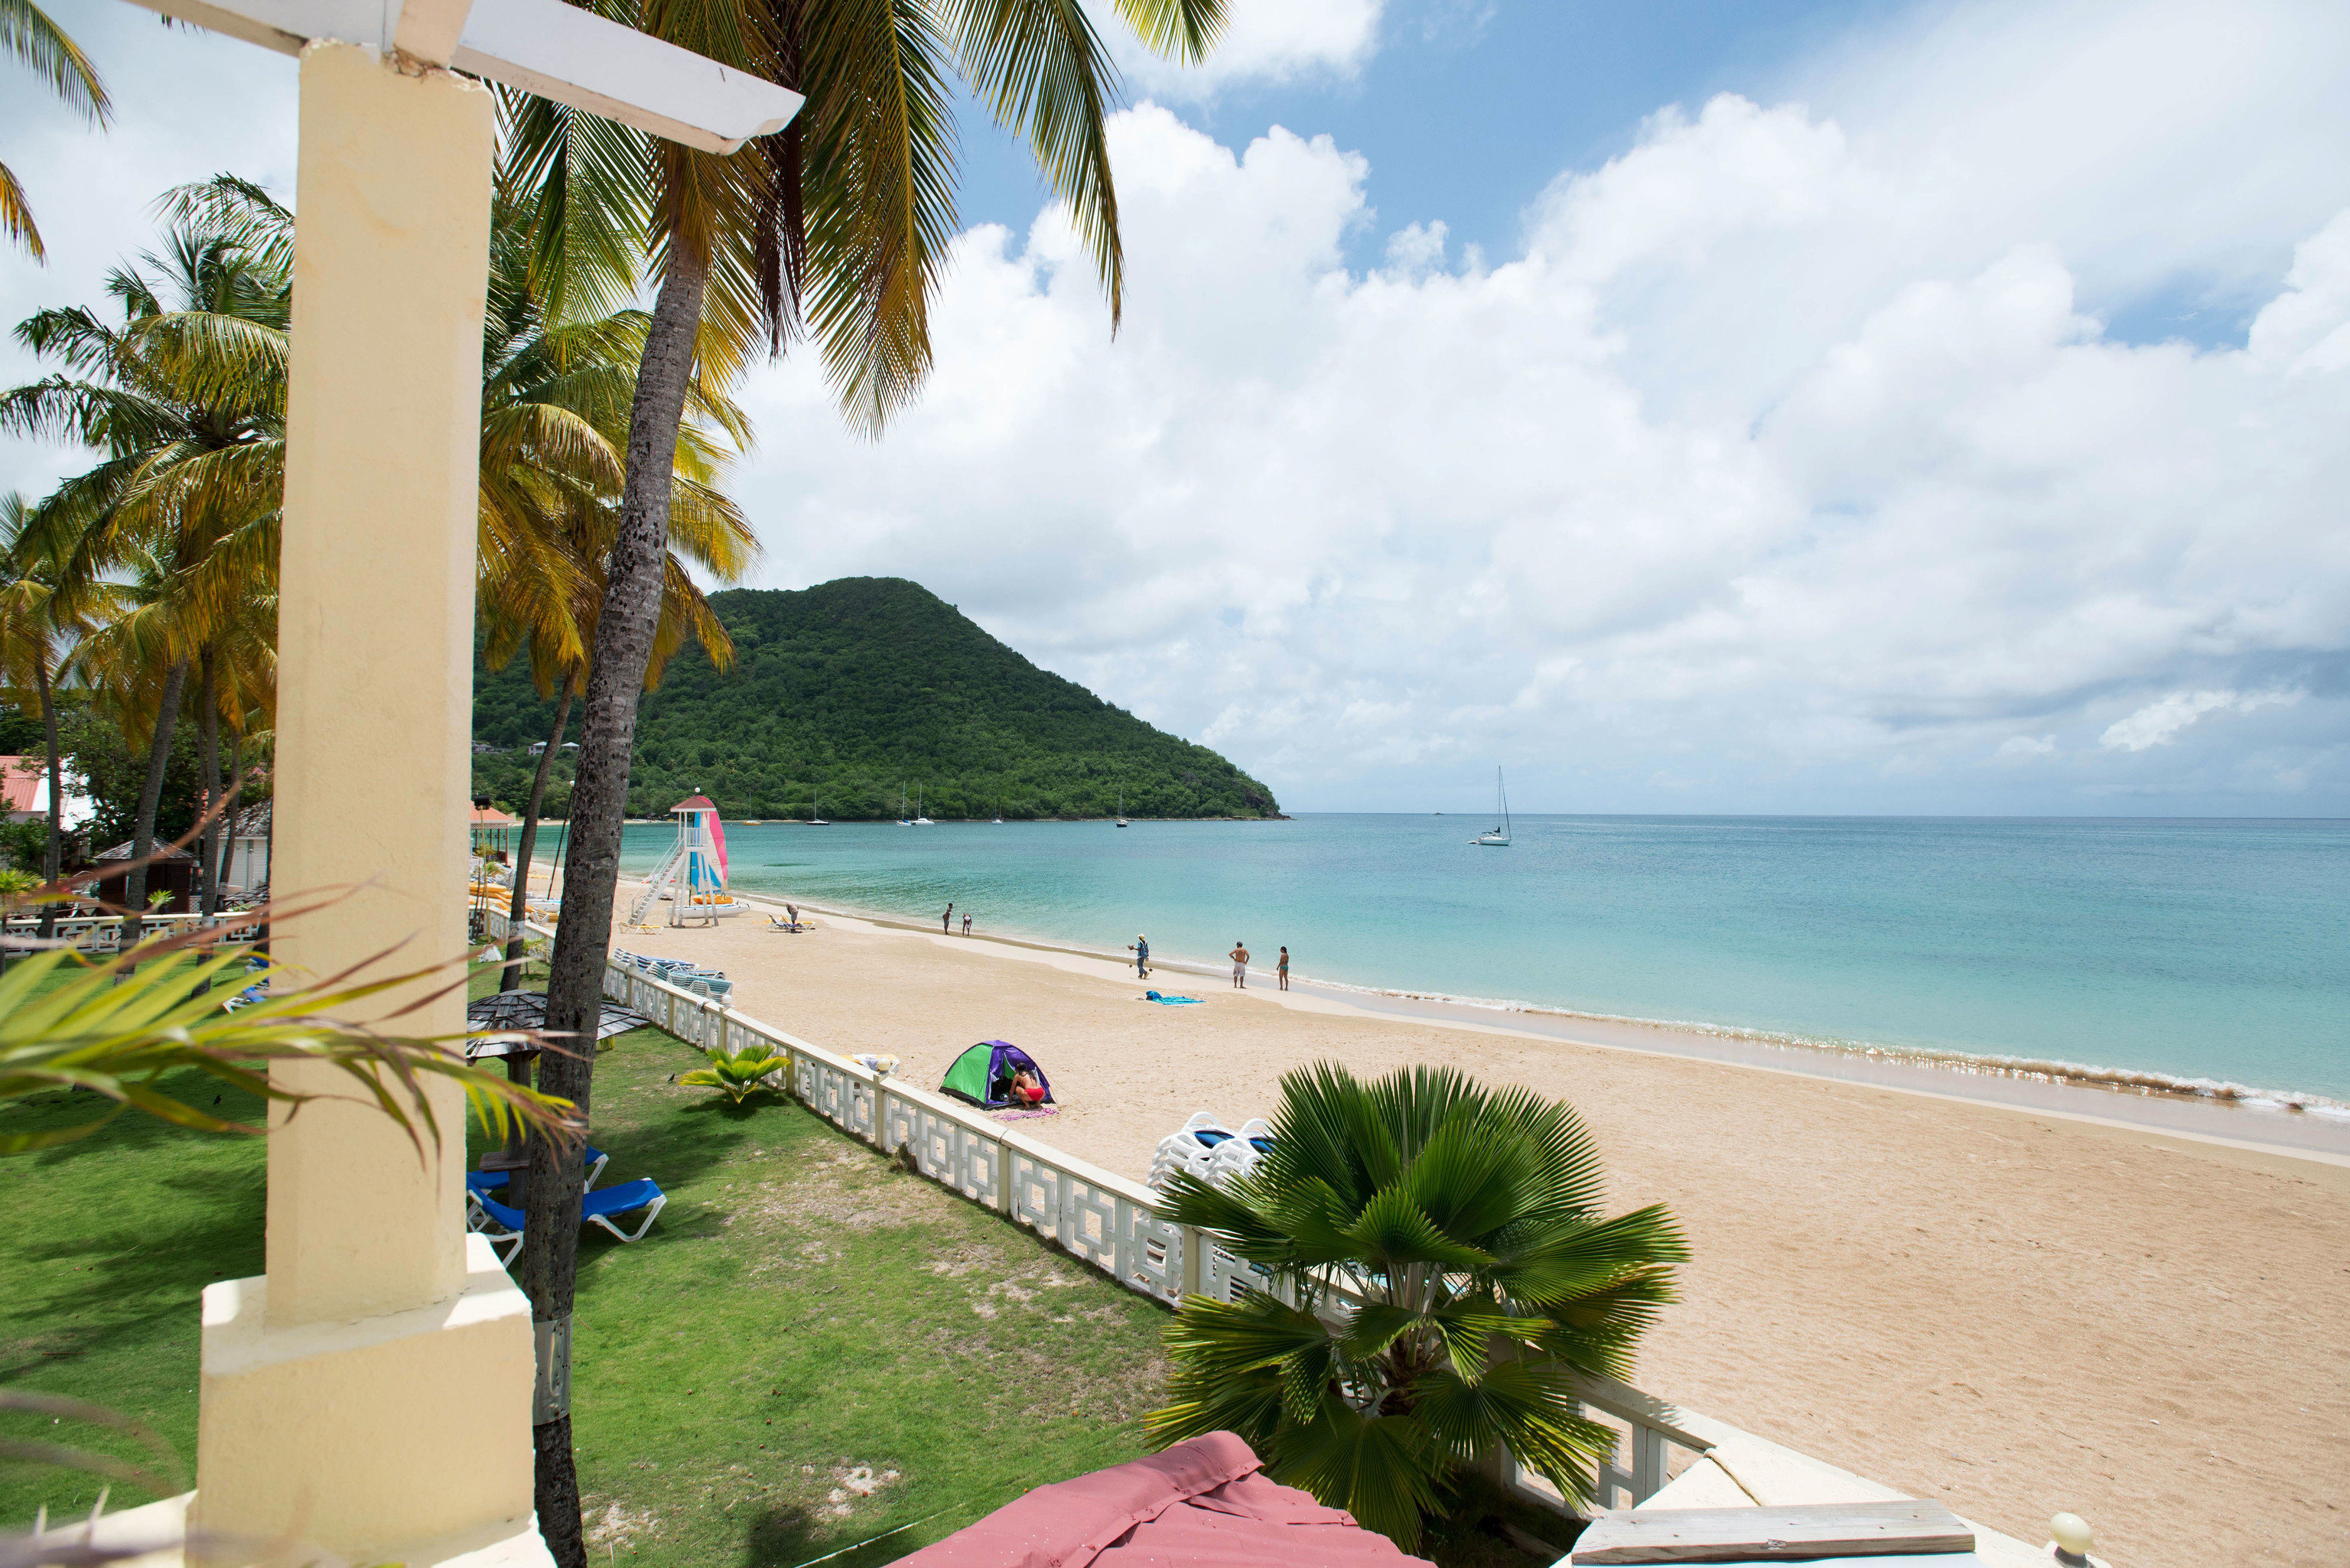 sky Beach caribbean Sea Ocean palm Coast shore Resort arecales tropics Nature cape swimming pool Villa lawn Lagoon Island cove lined plant shade day sandy